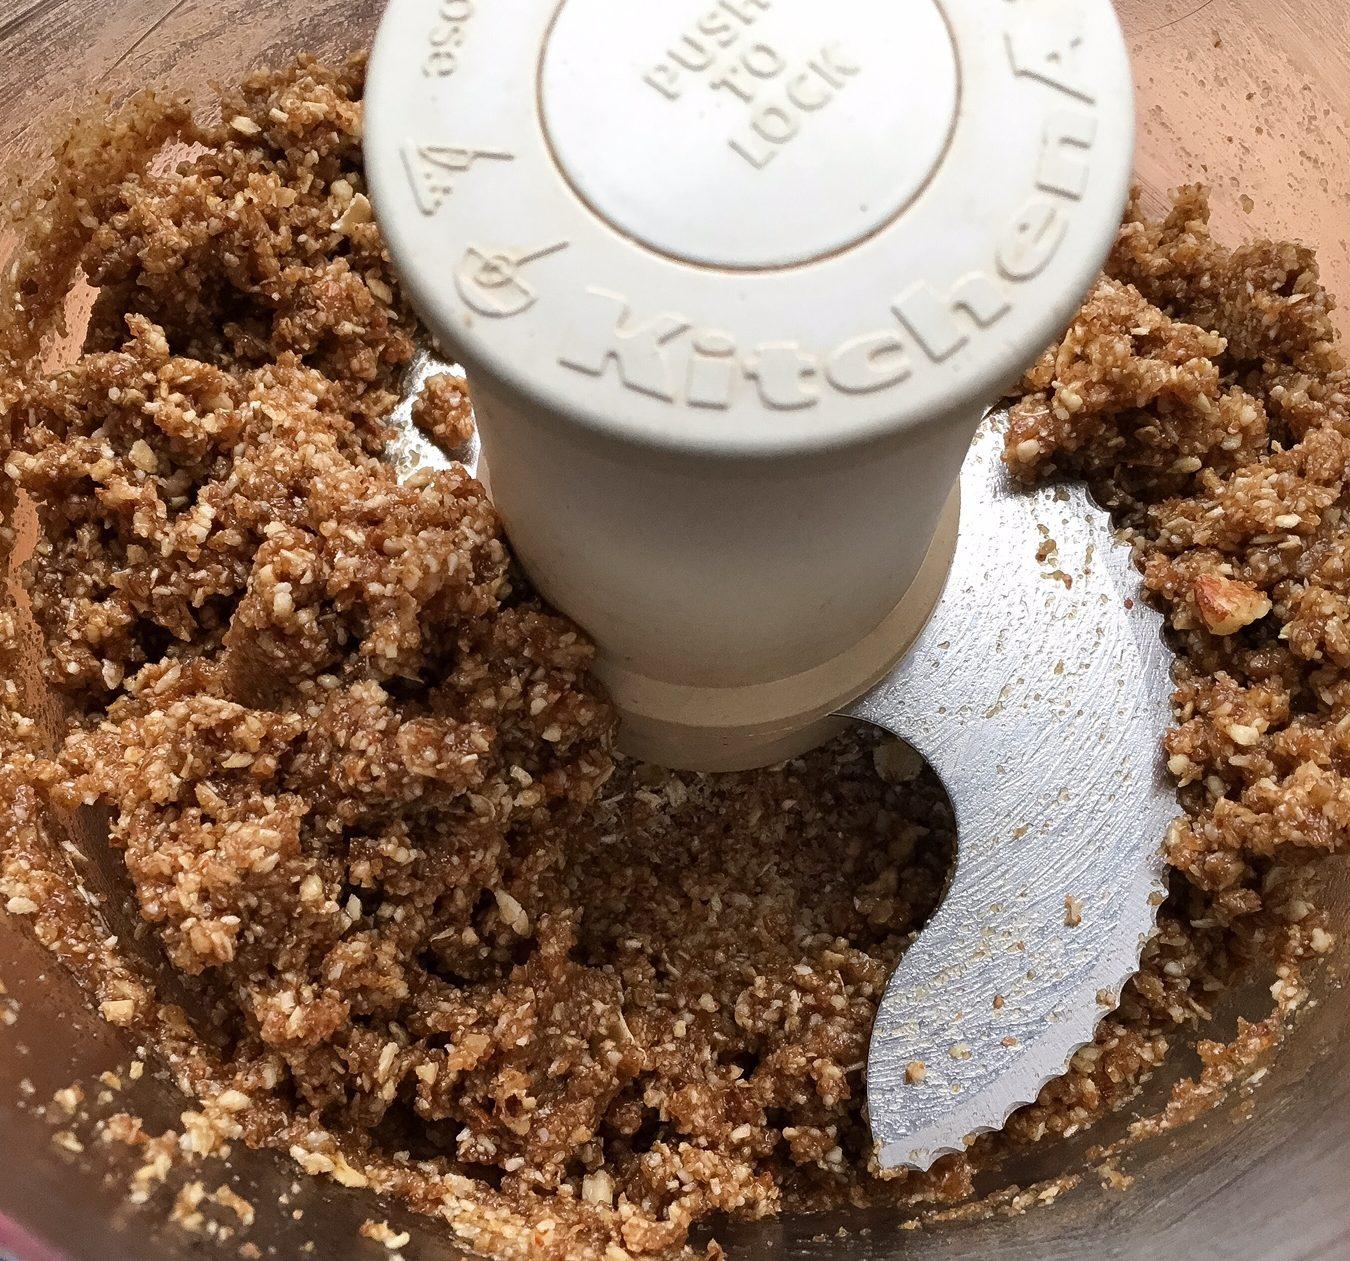 almonds, oats, cookie dough, oat bars, espresso, gluten free oats, vegan